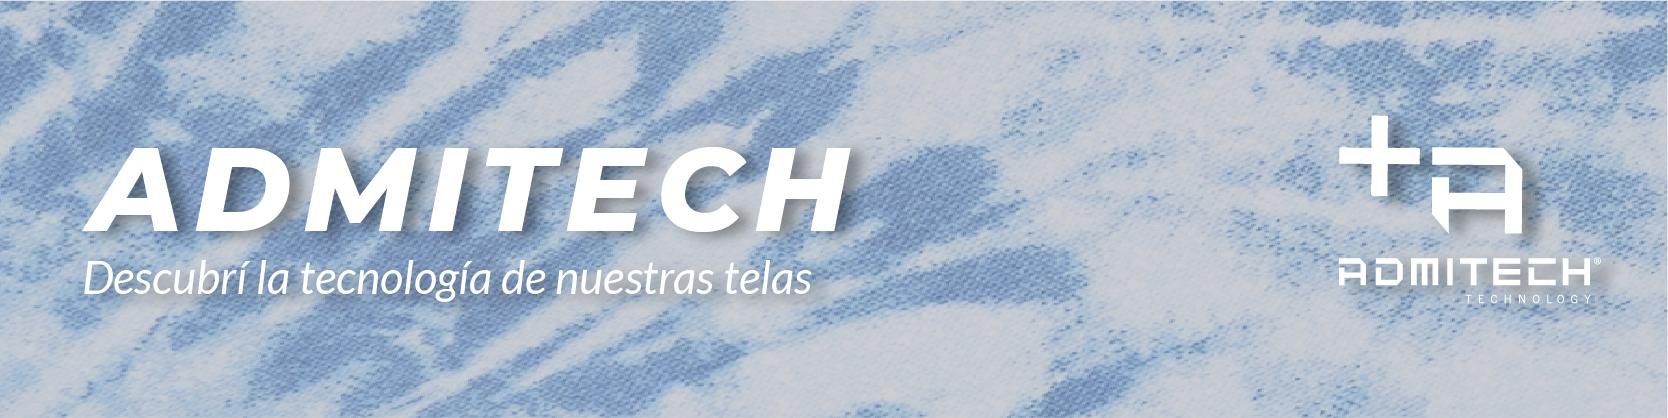 AdmiTech